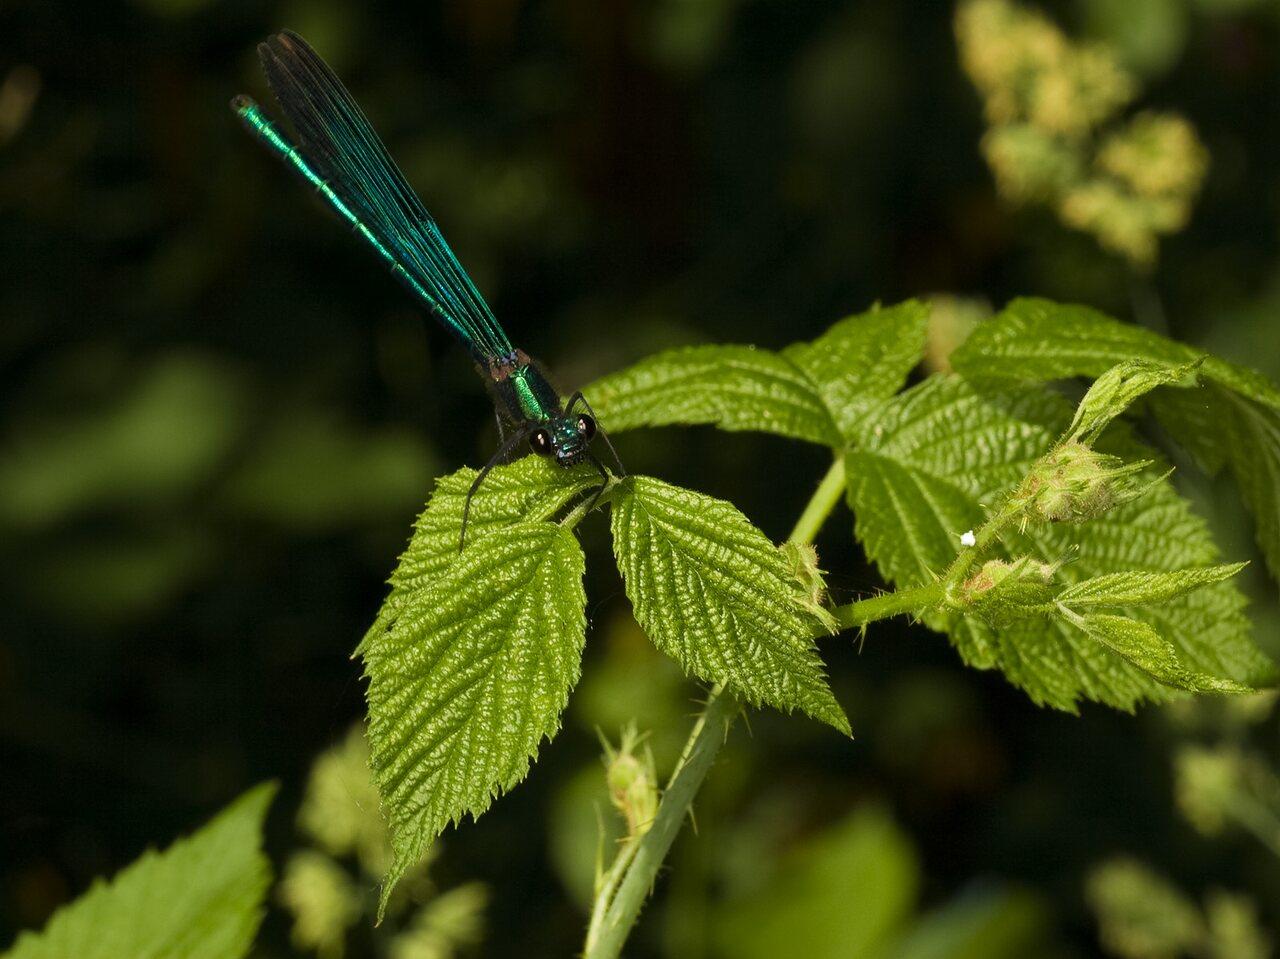 Calopteryx-splendens-3626.jpg